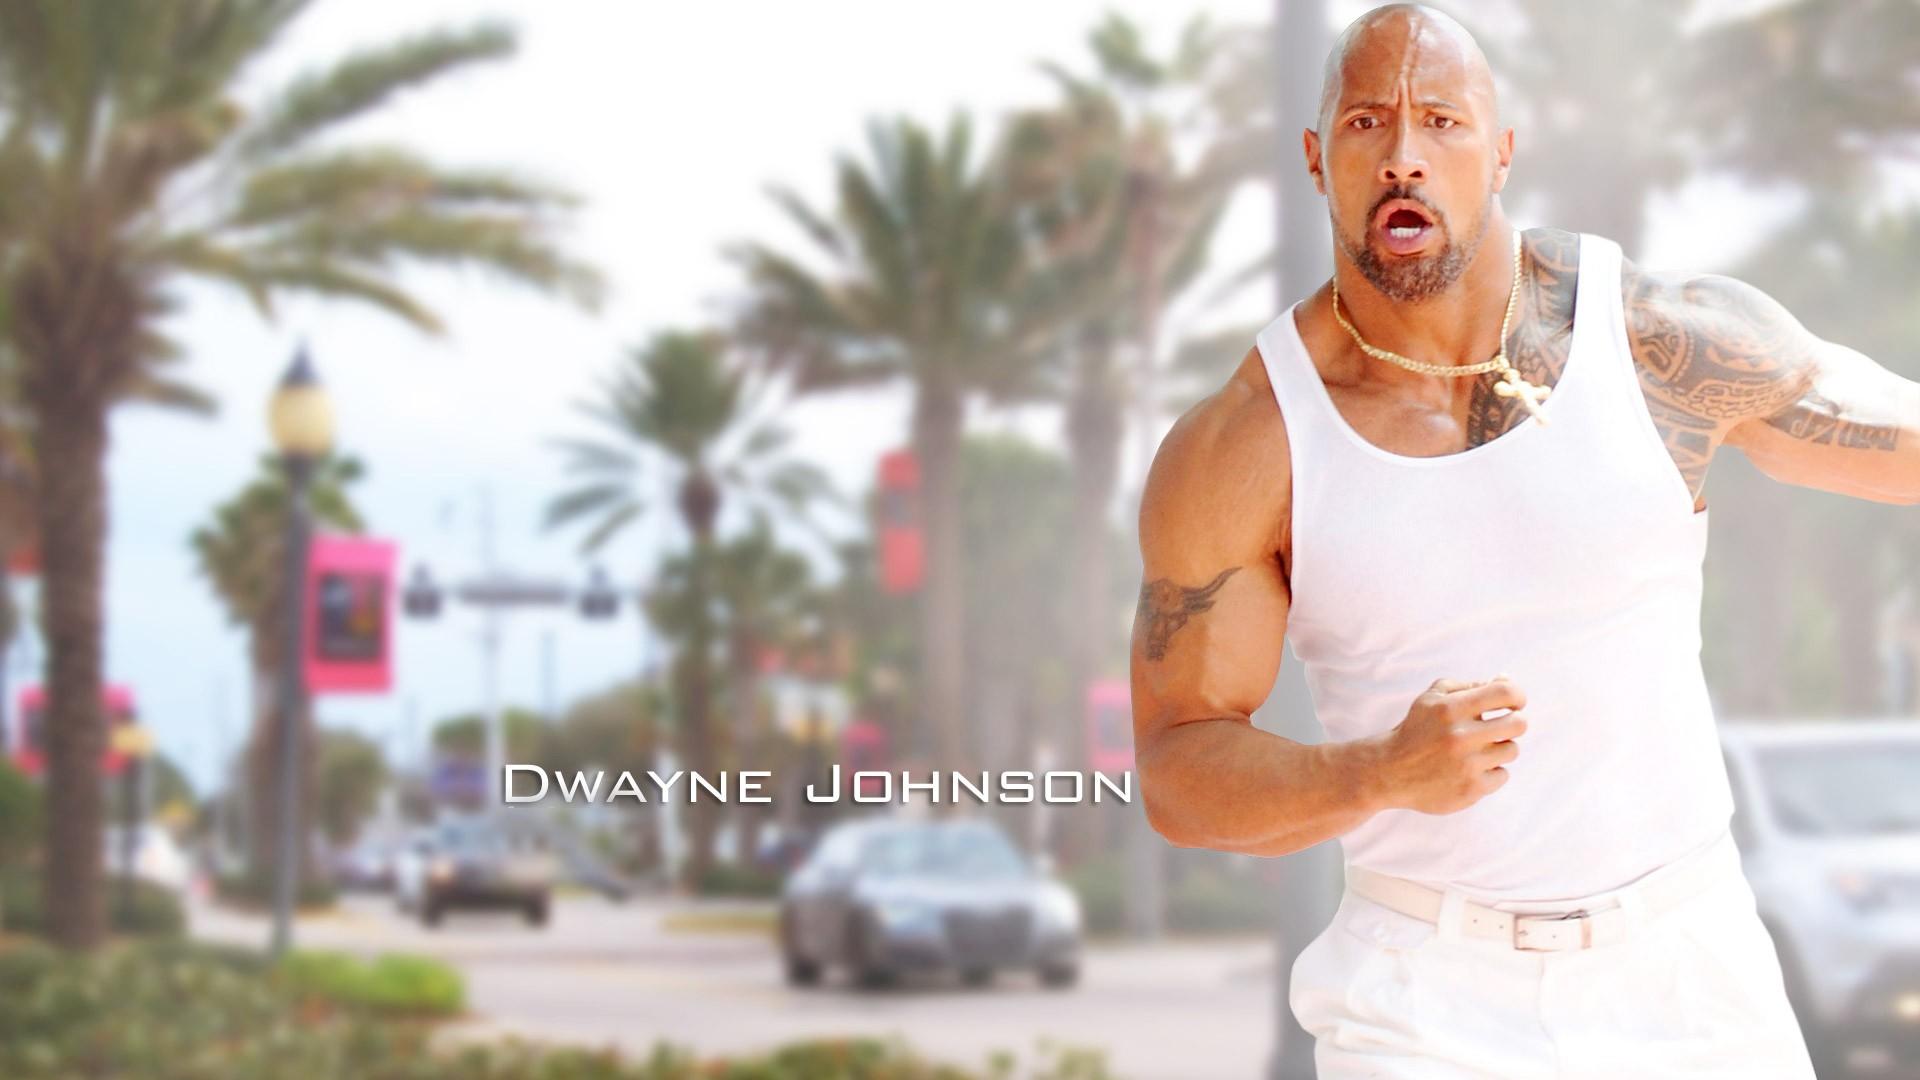 World's Top 10 Richest Actors in 2017, Dwayne Johnson, The rock, WWE Superstar